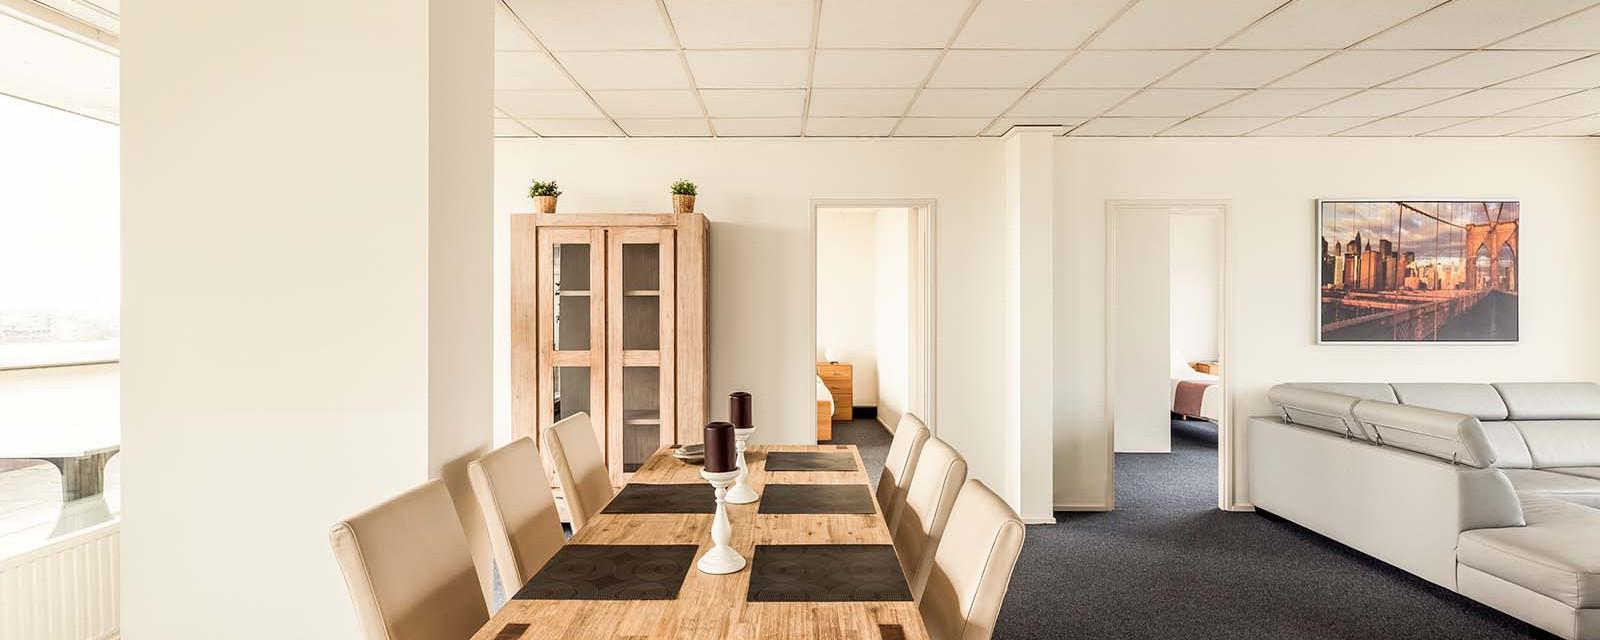 Ibis Hotel den Haag Scheveningen - Apartment overview